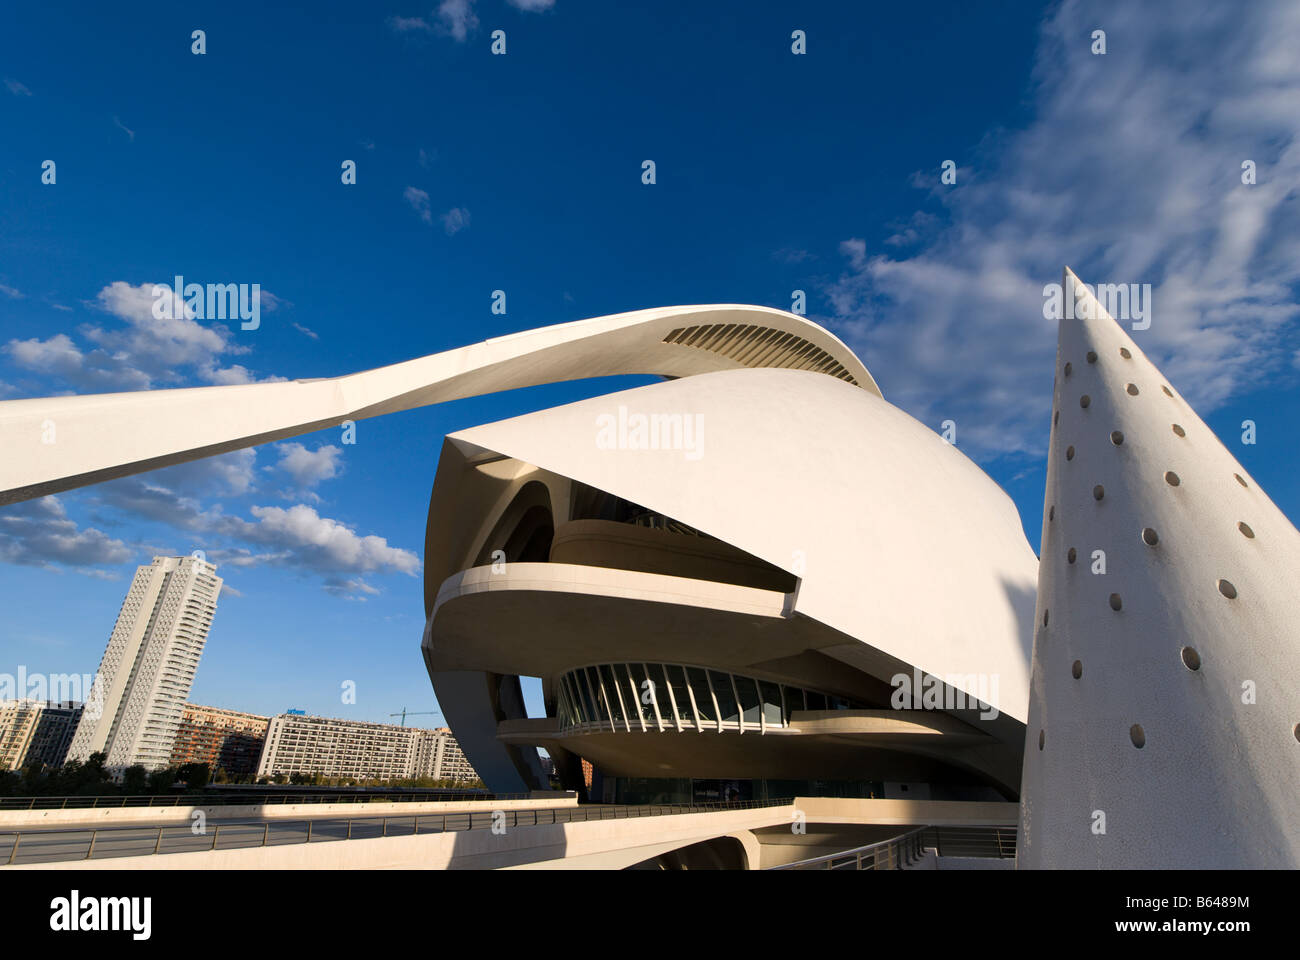 Entrance to the Valencia Opera House El Palau de les Arts Reina Sofía Valencia Spain Stock Photo